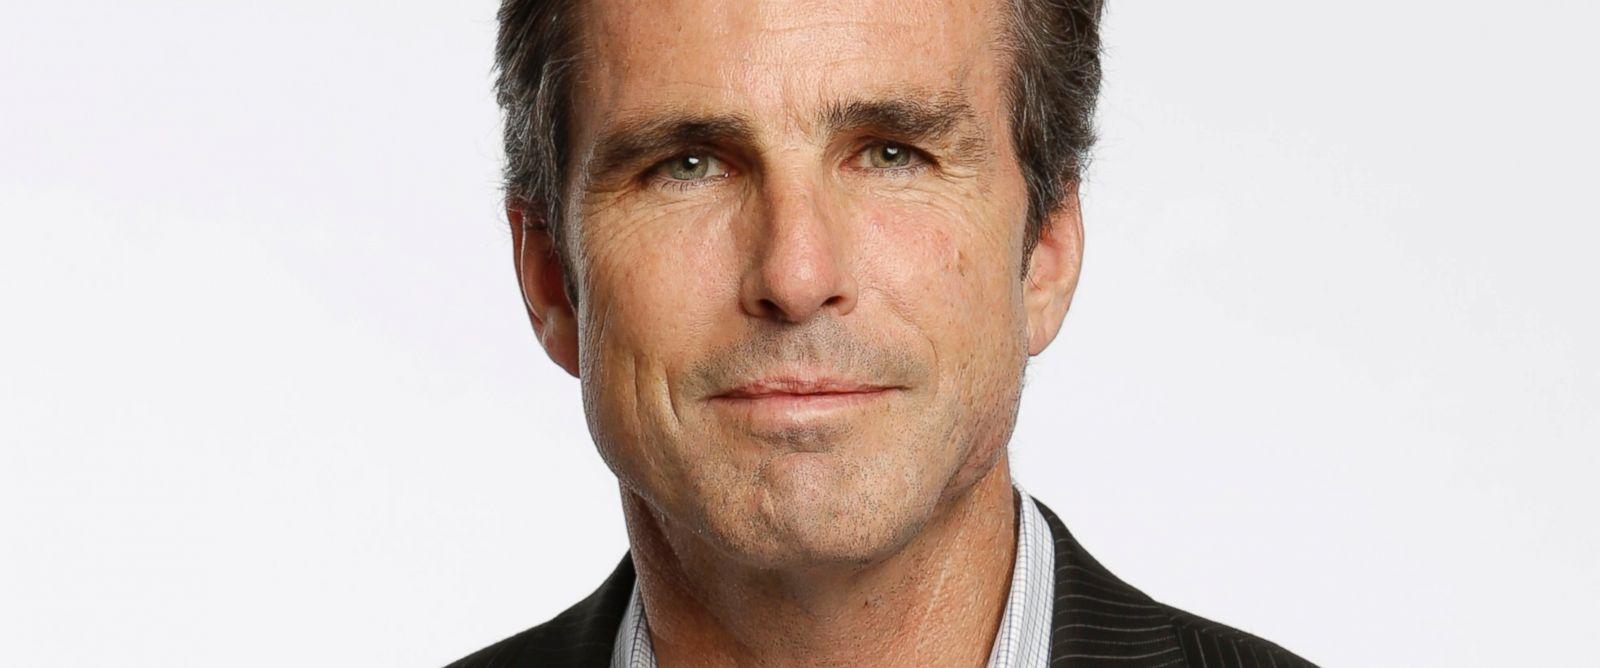 PHOTO: ABC News correspondent Bob Woodruff